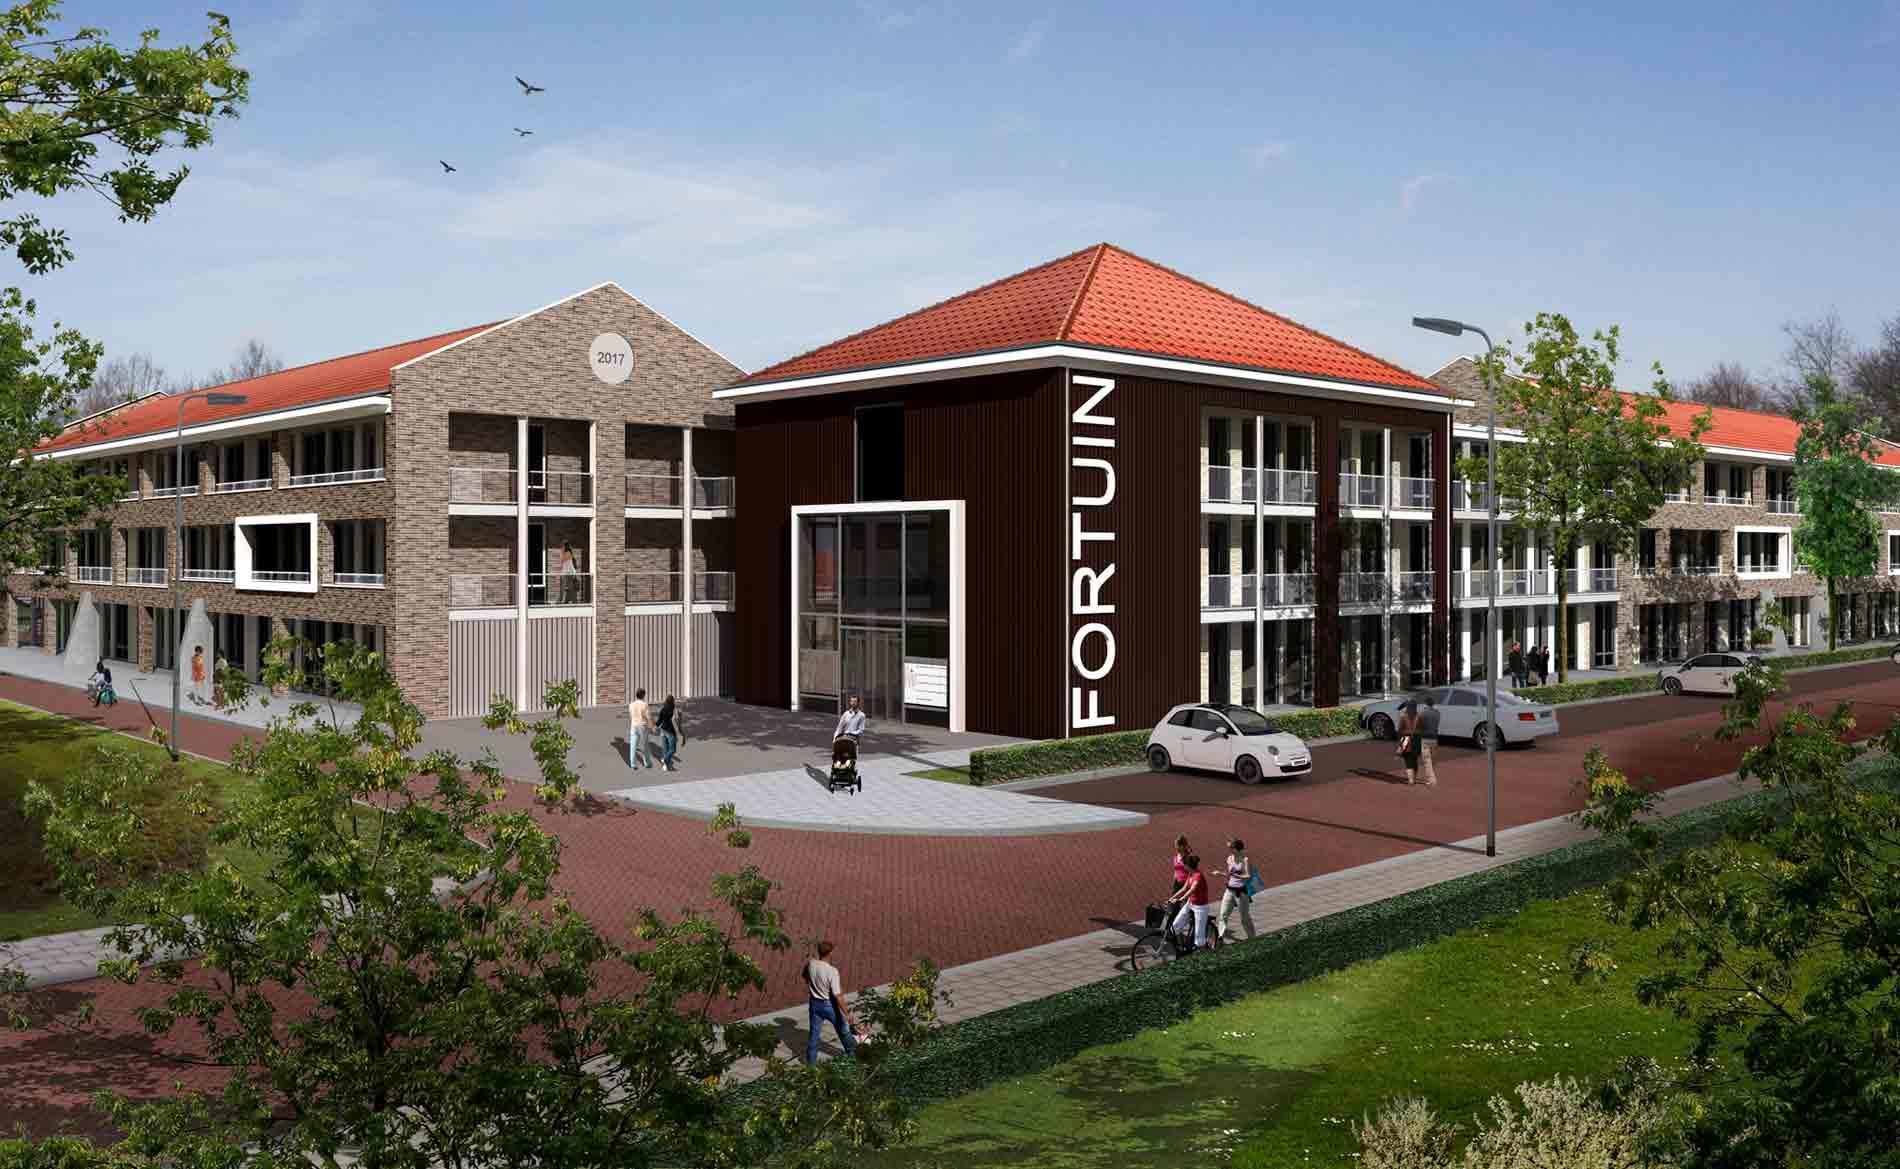 energieneutral NOM EPC=0 duurzaam appartementen Spatter- en Fortuinstraat Wormer BBHD architecten herstructurering landelijk architectuur dorps bouwen